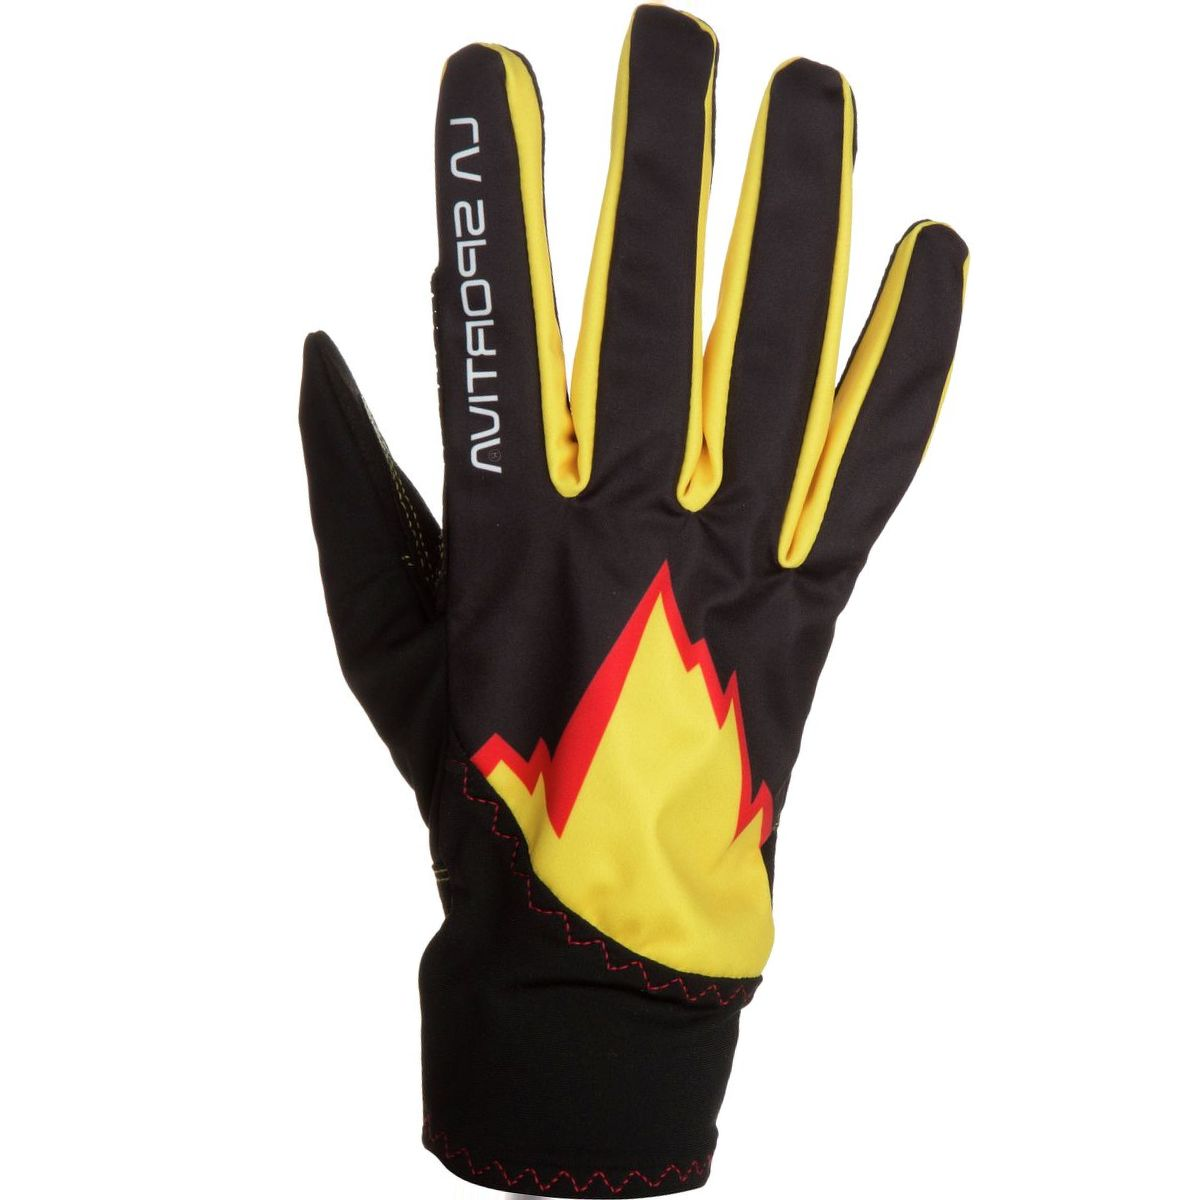 La Sportiva Syborg Glove - Men's